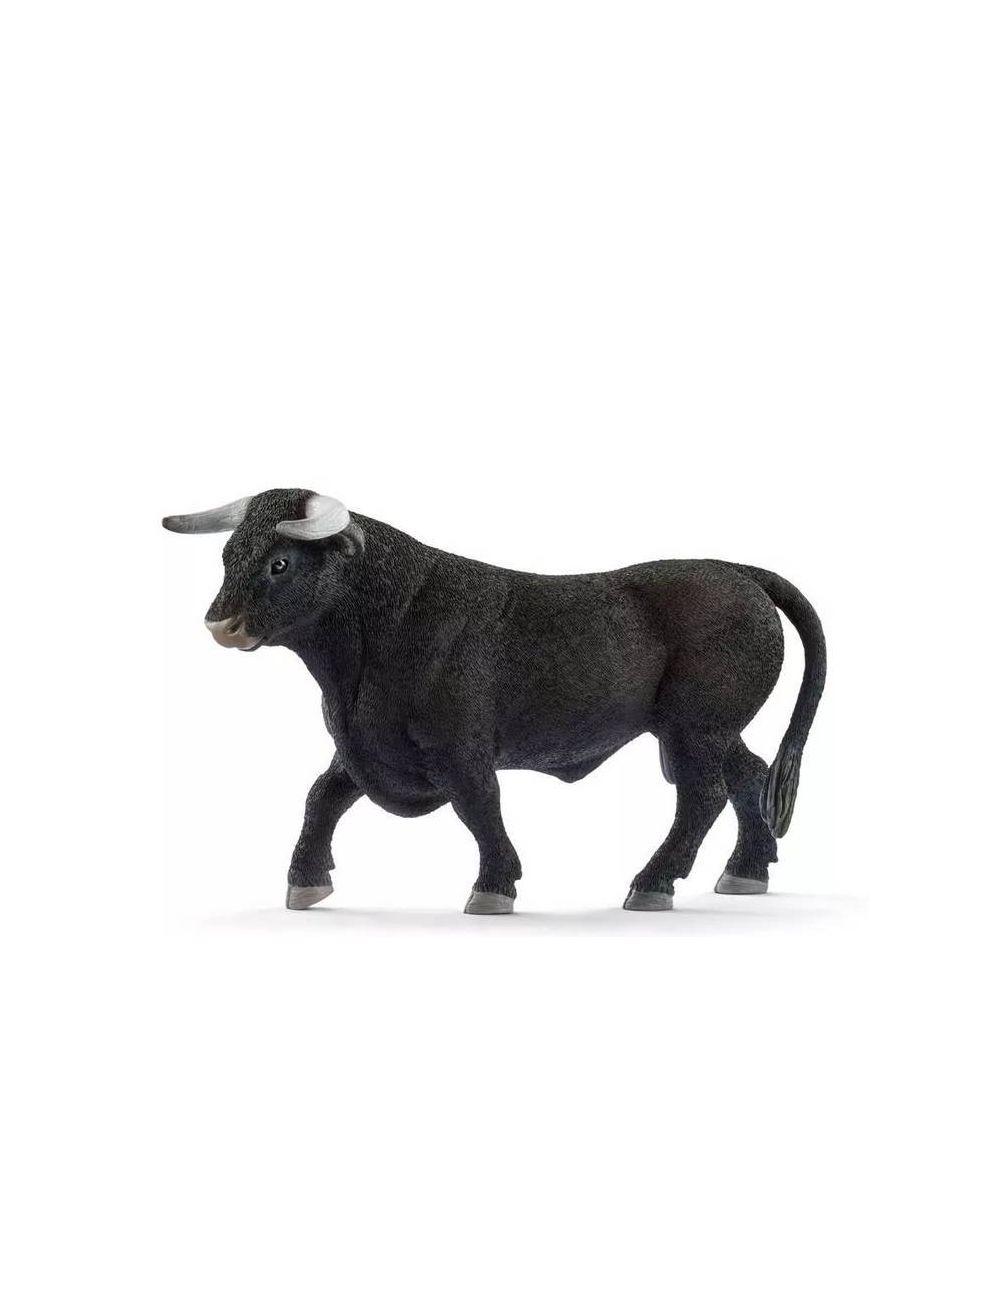 Schleich 13875 Figurka Czarnego Byka